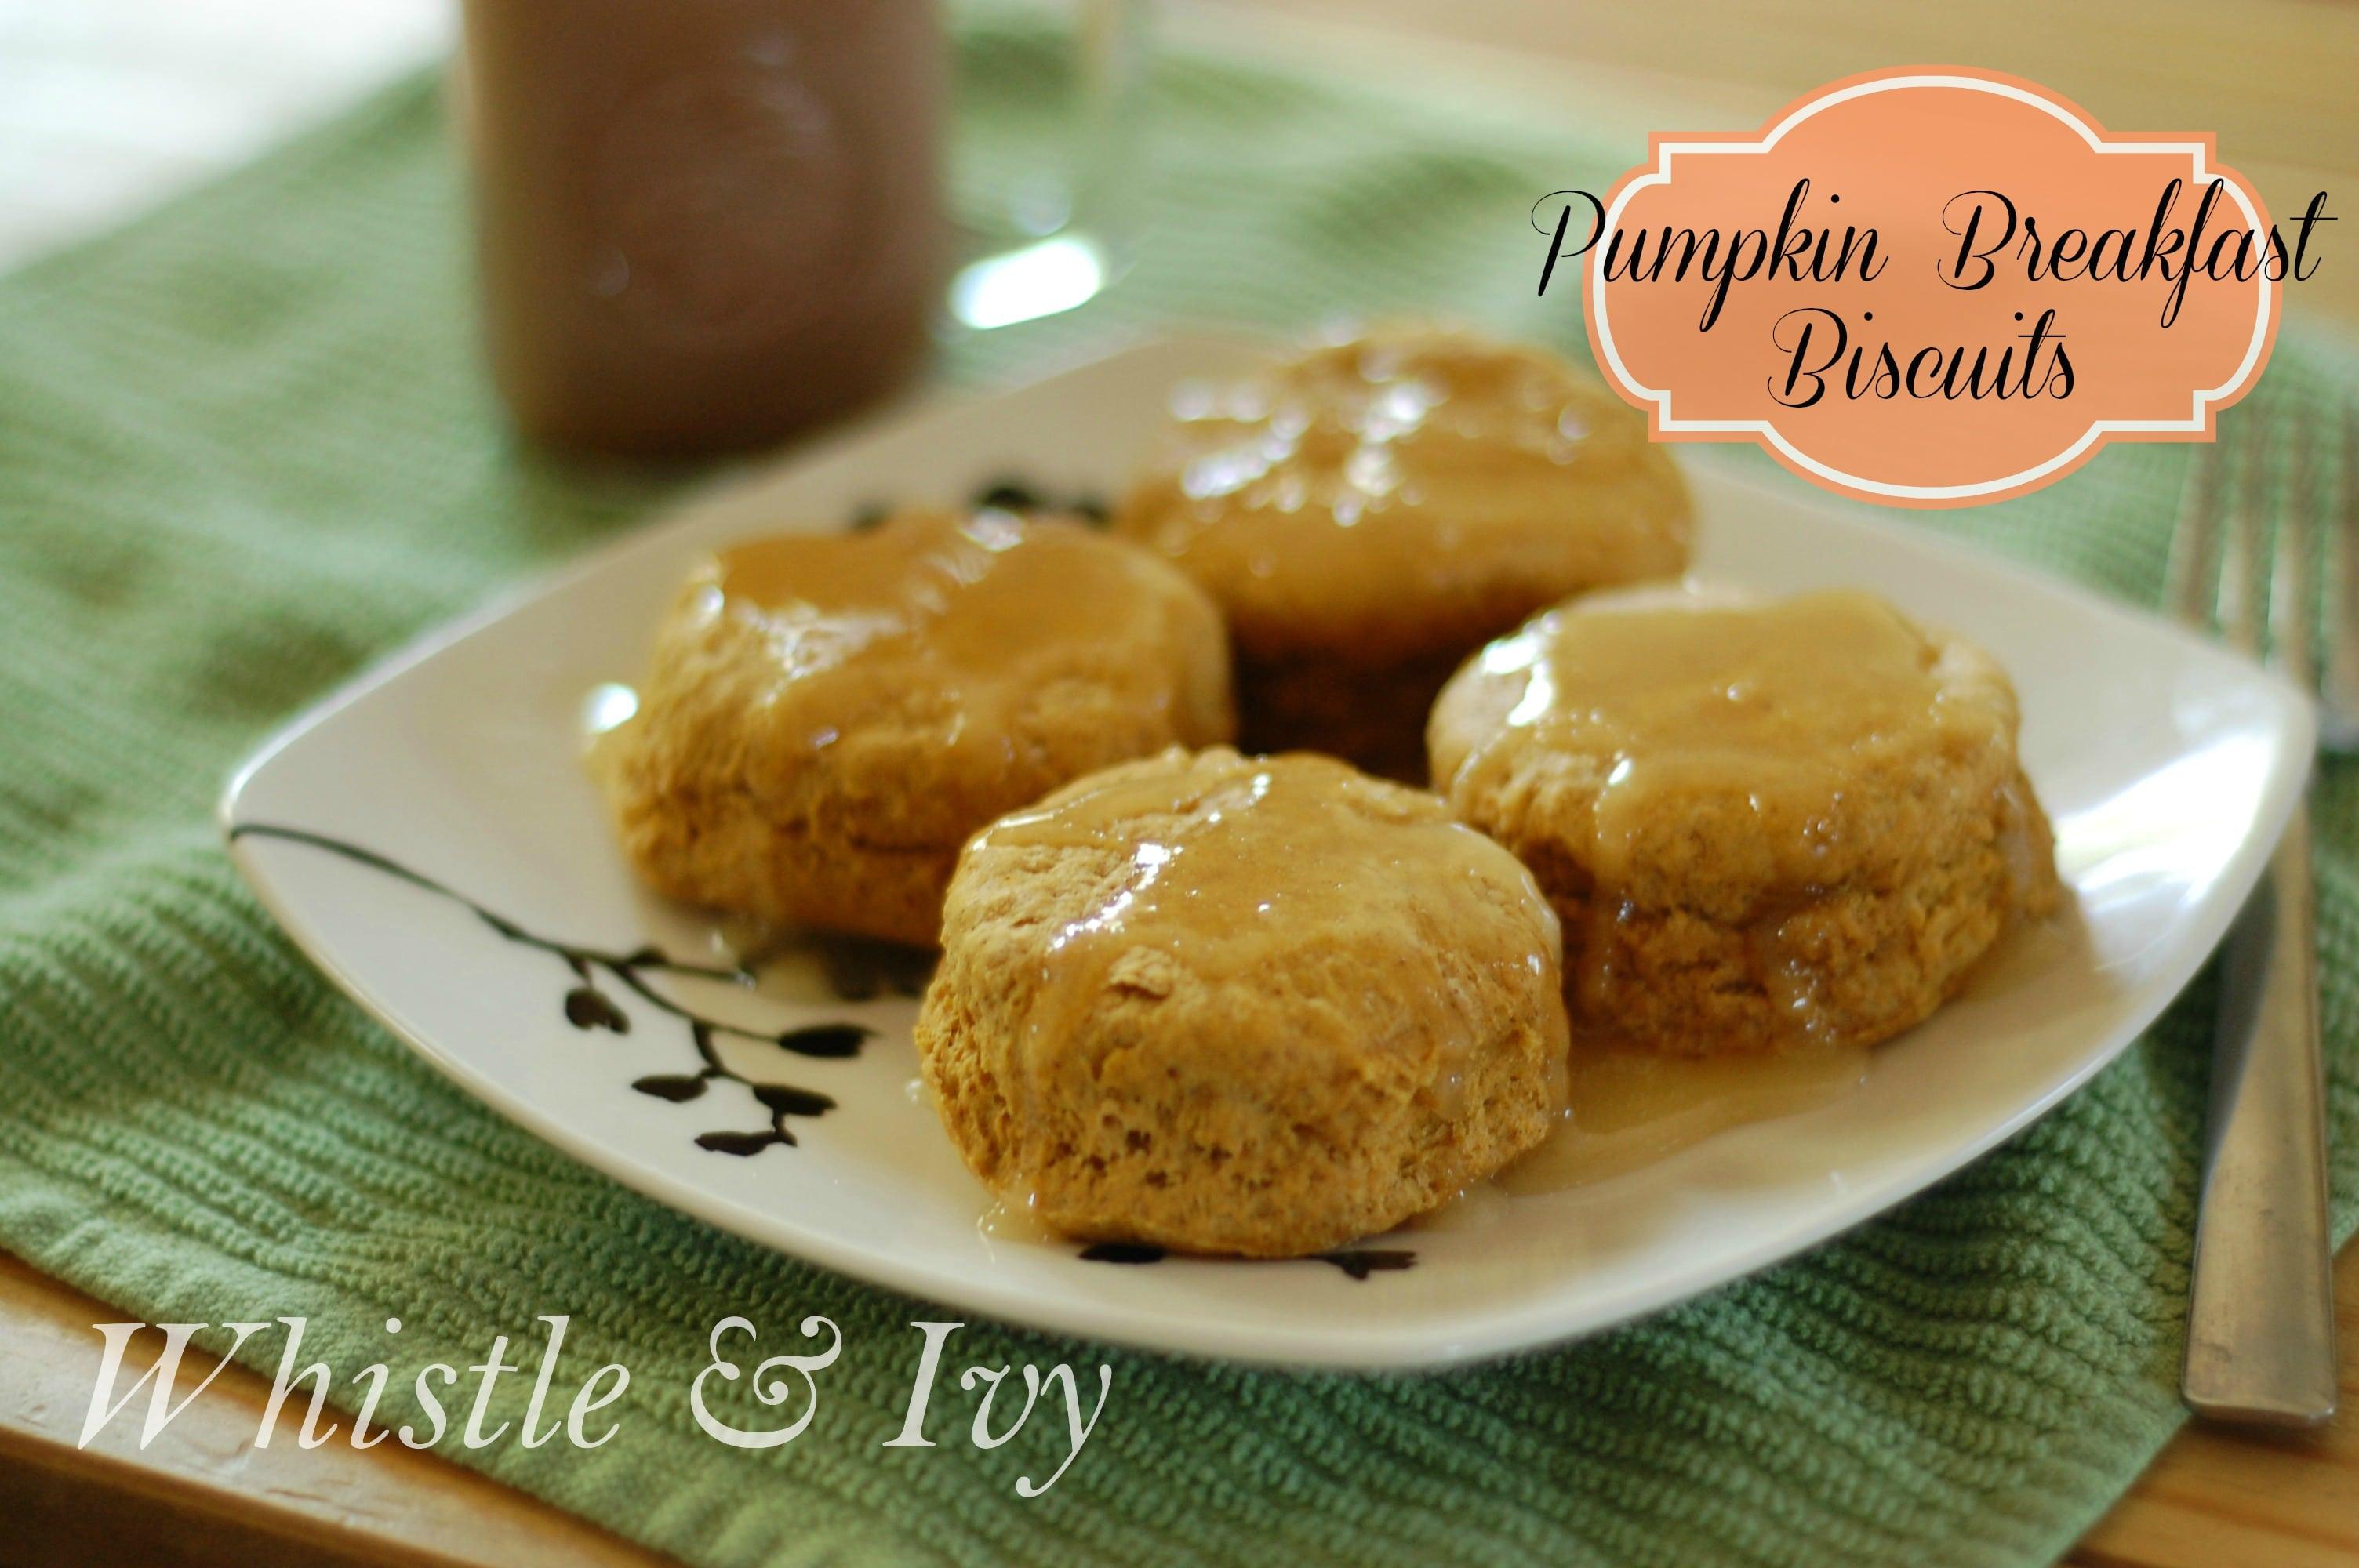 Pumpkin Spice Breakfast Biscuits - Perfect Fall Breakfast Recipe!